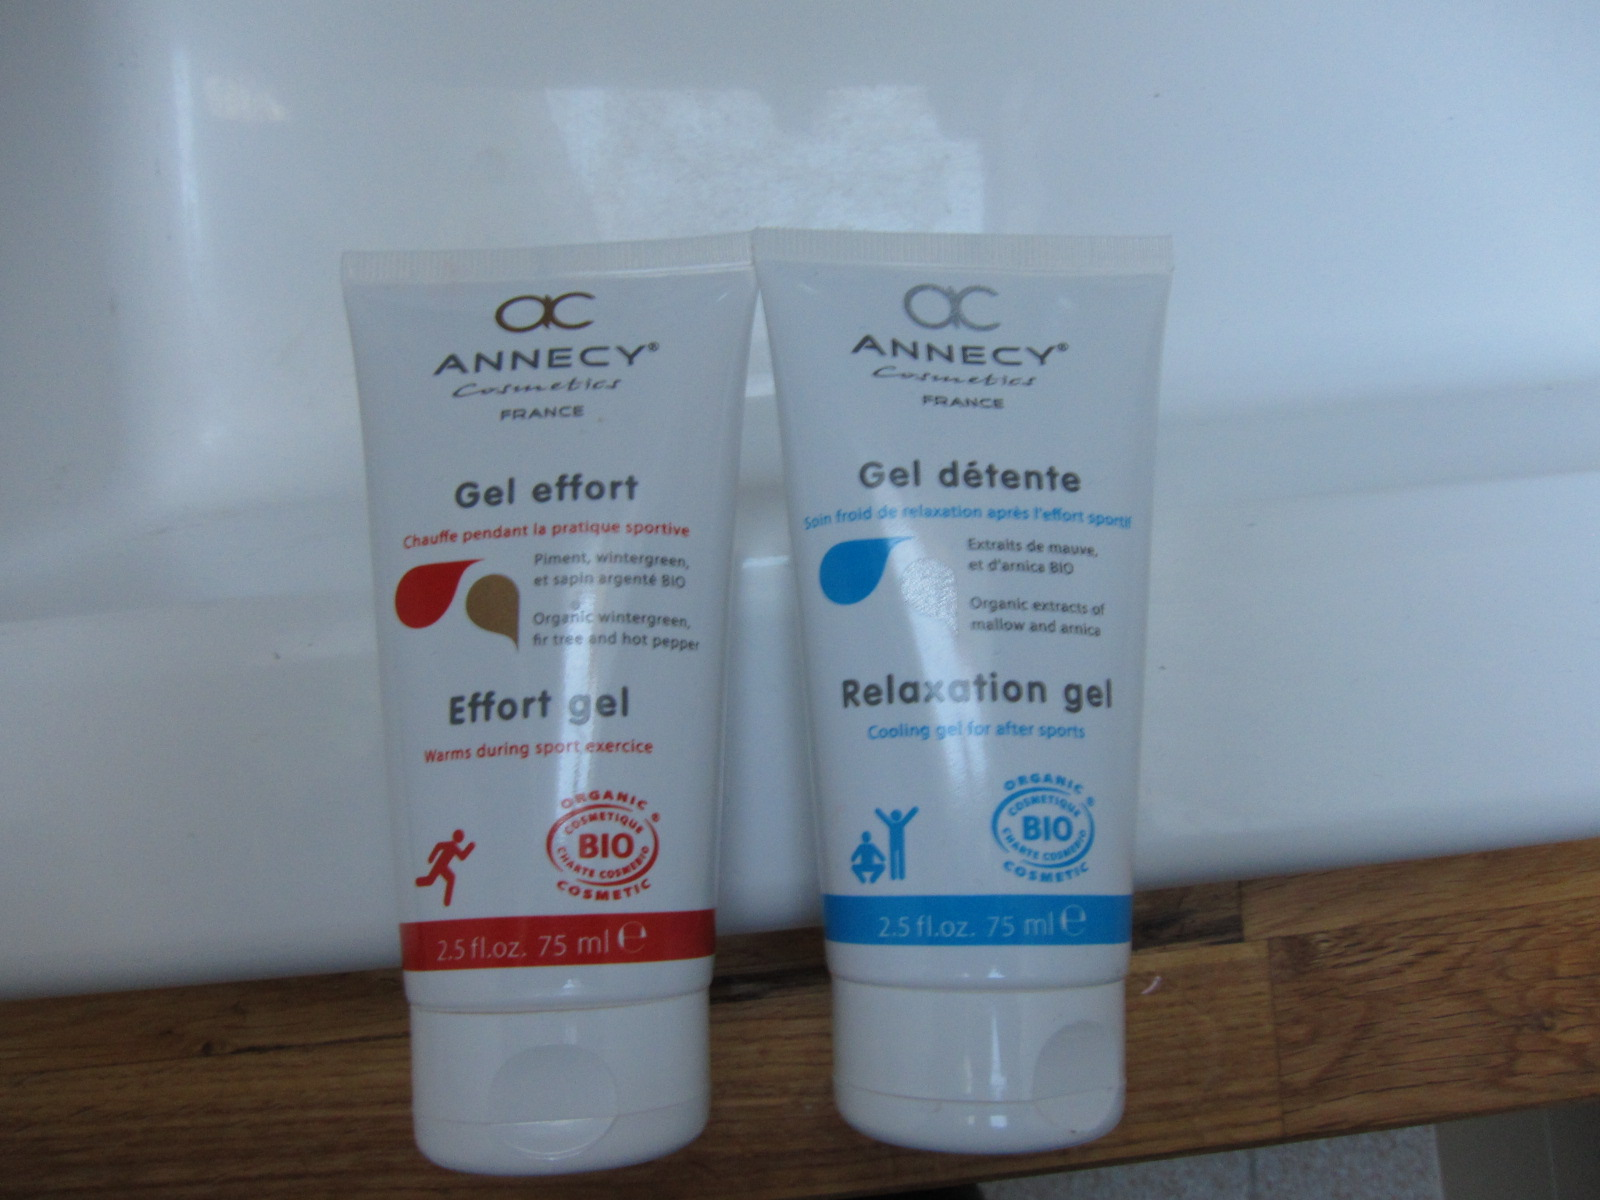 Annecy Cosmetics - Gel effort et Gel détente